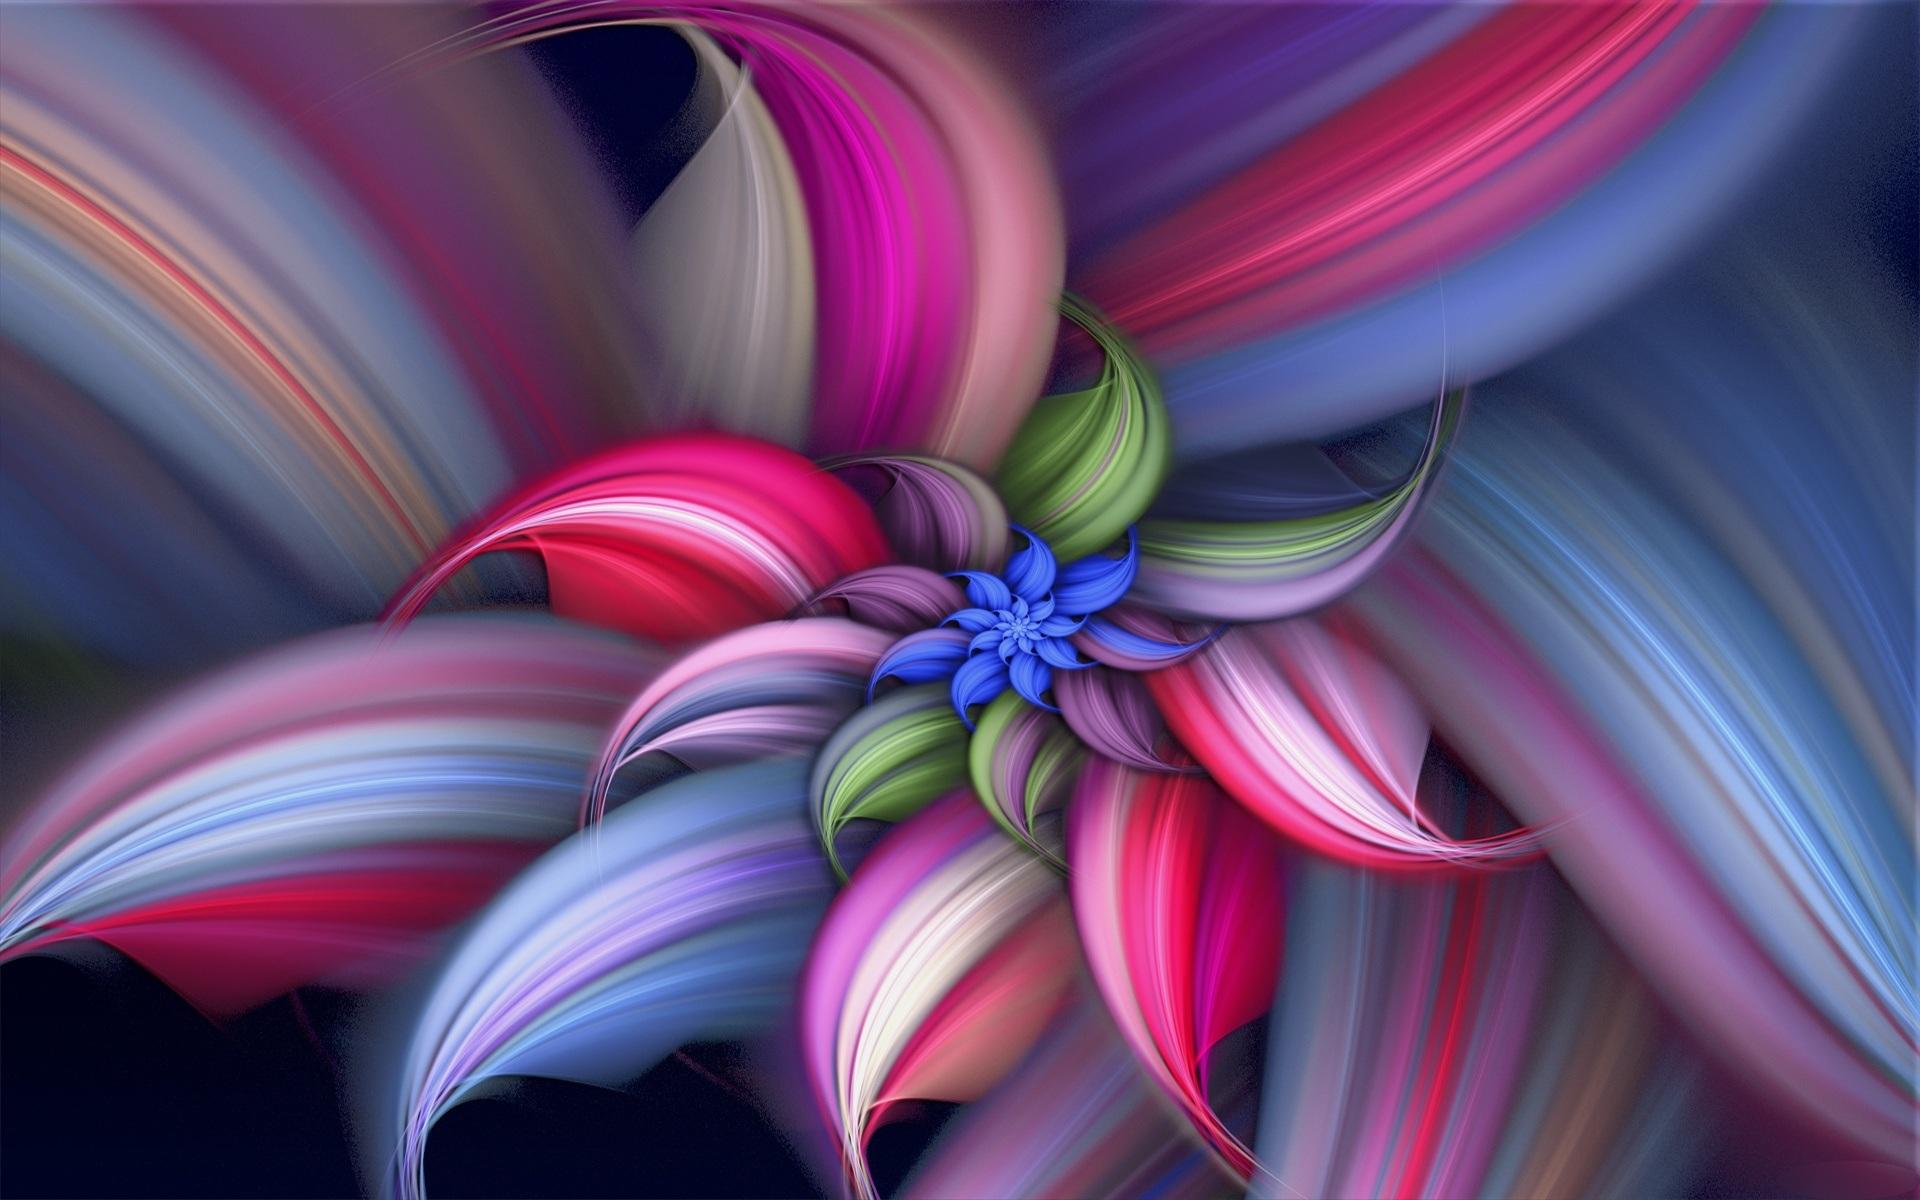 Desktop Wallpaper hd 3D Full Screen Flowers 1920x1200